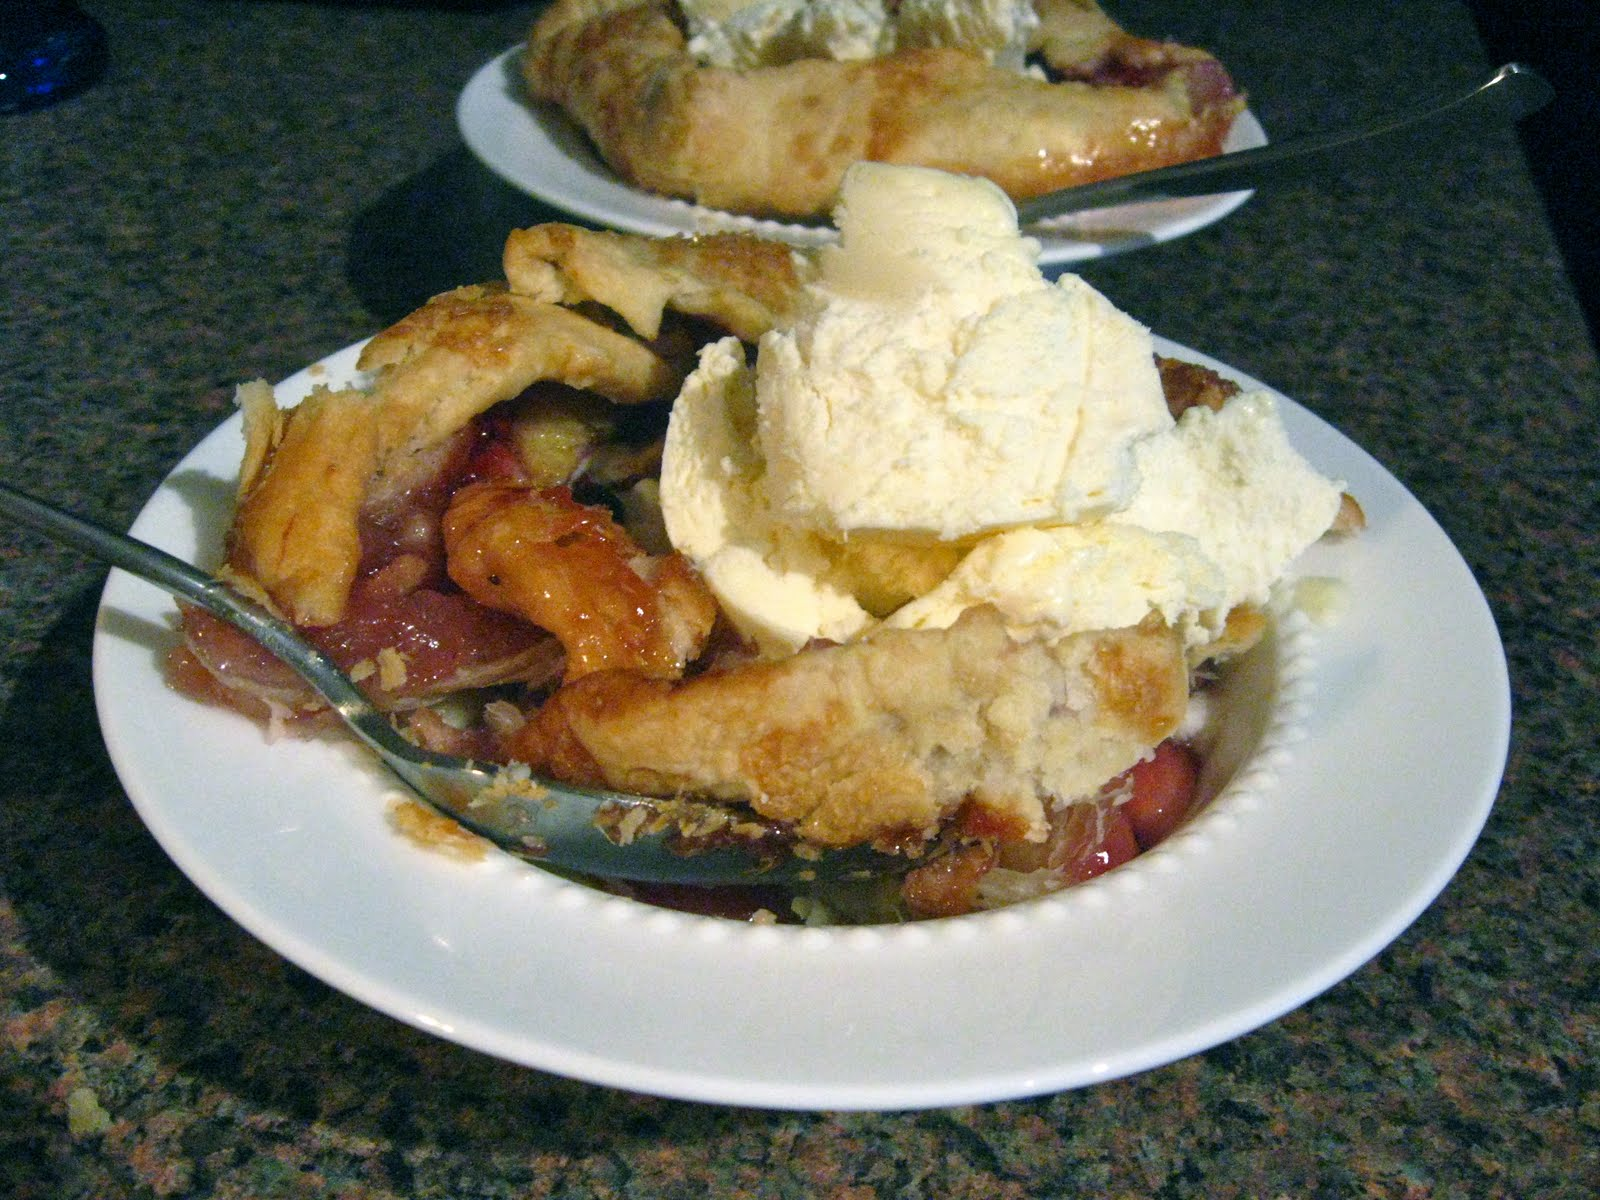 Boston Sweetie: Strawberry Banana Galette